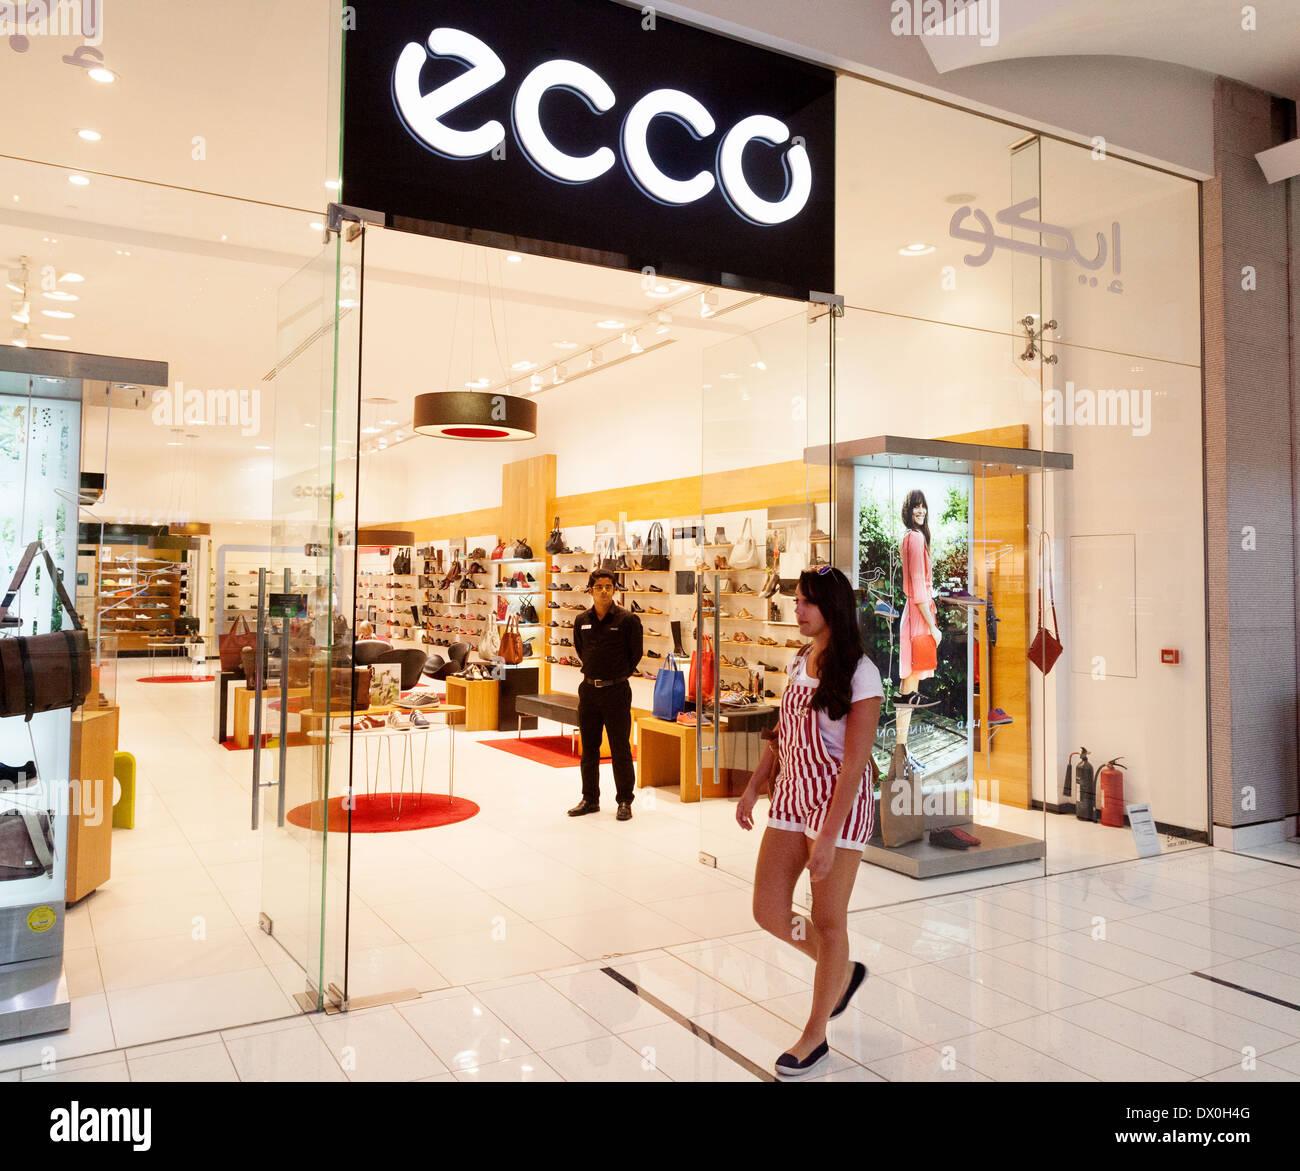 Speicherndubai Arabische Schuhe Ecco Speicherndubai Schuhe Schuhe Arabische Ecco Arabische Ecco sdQhxtrC